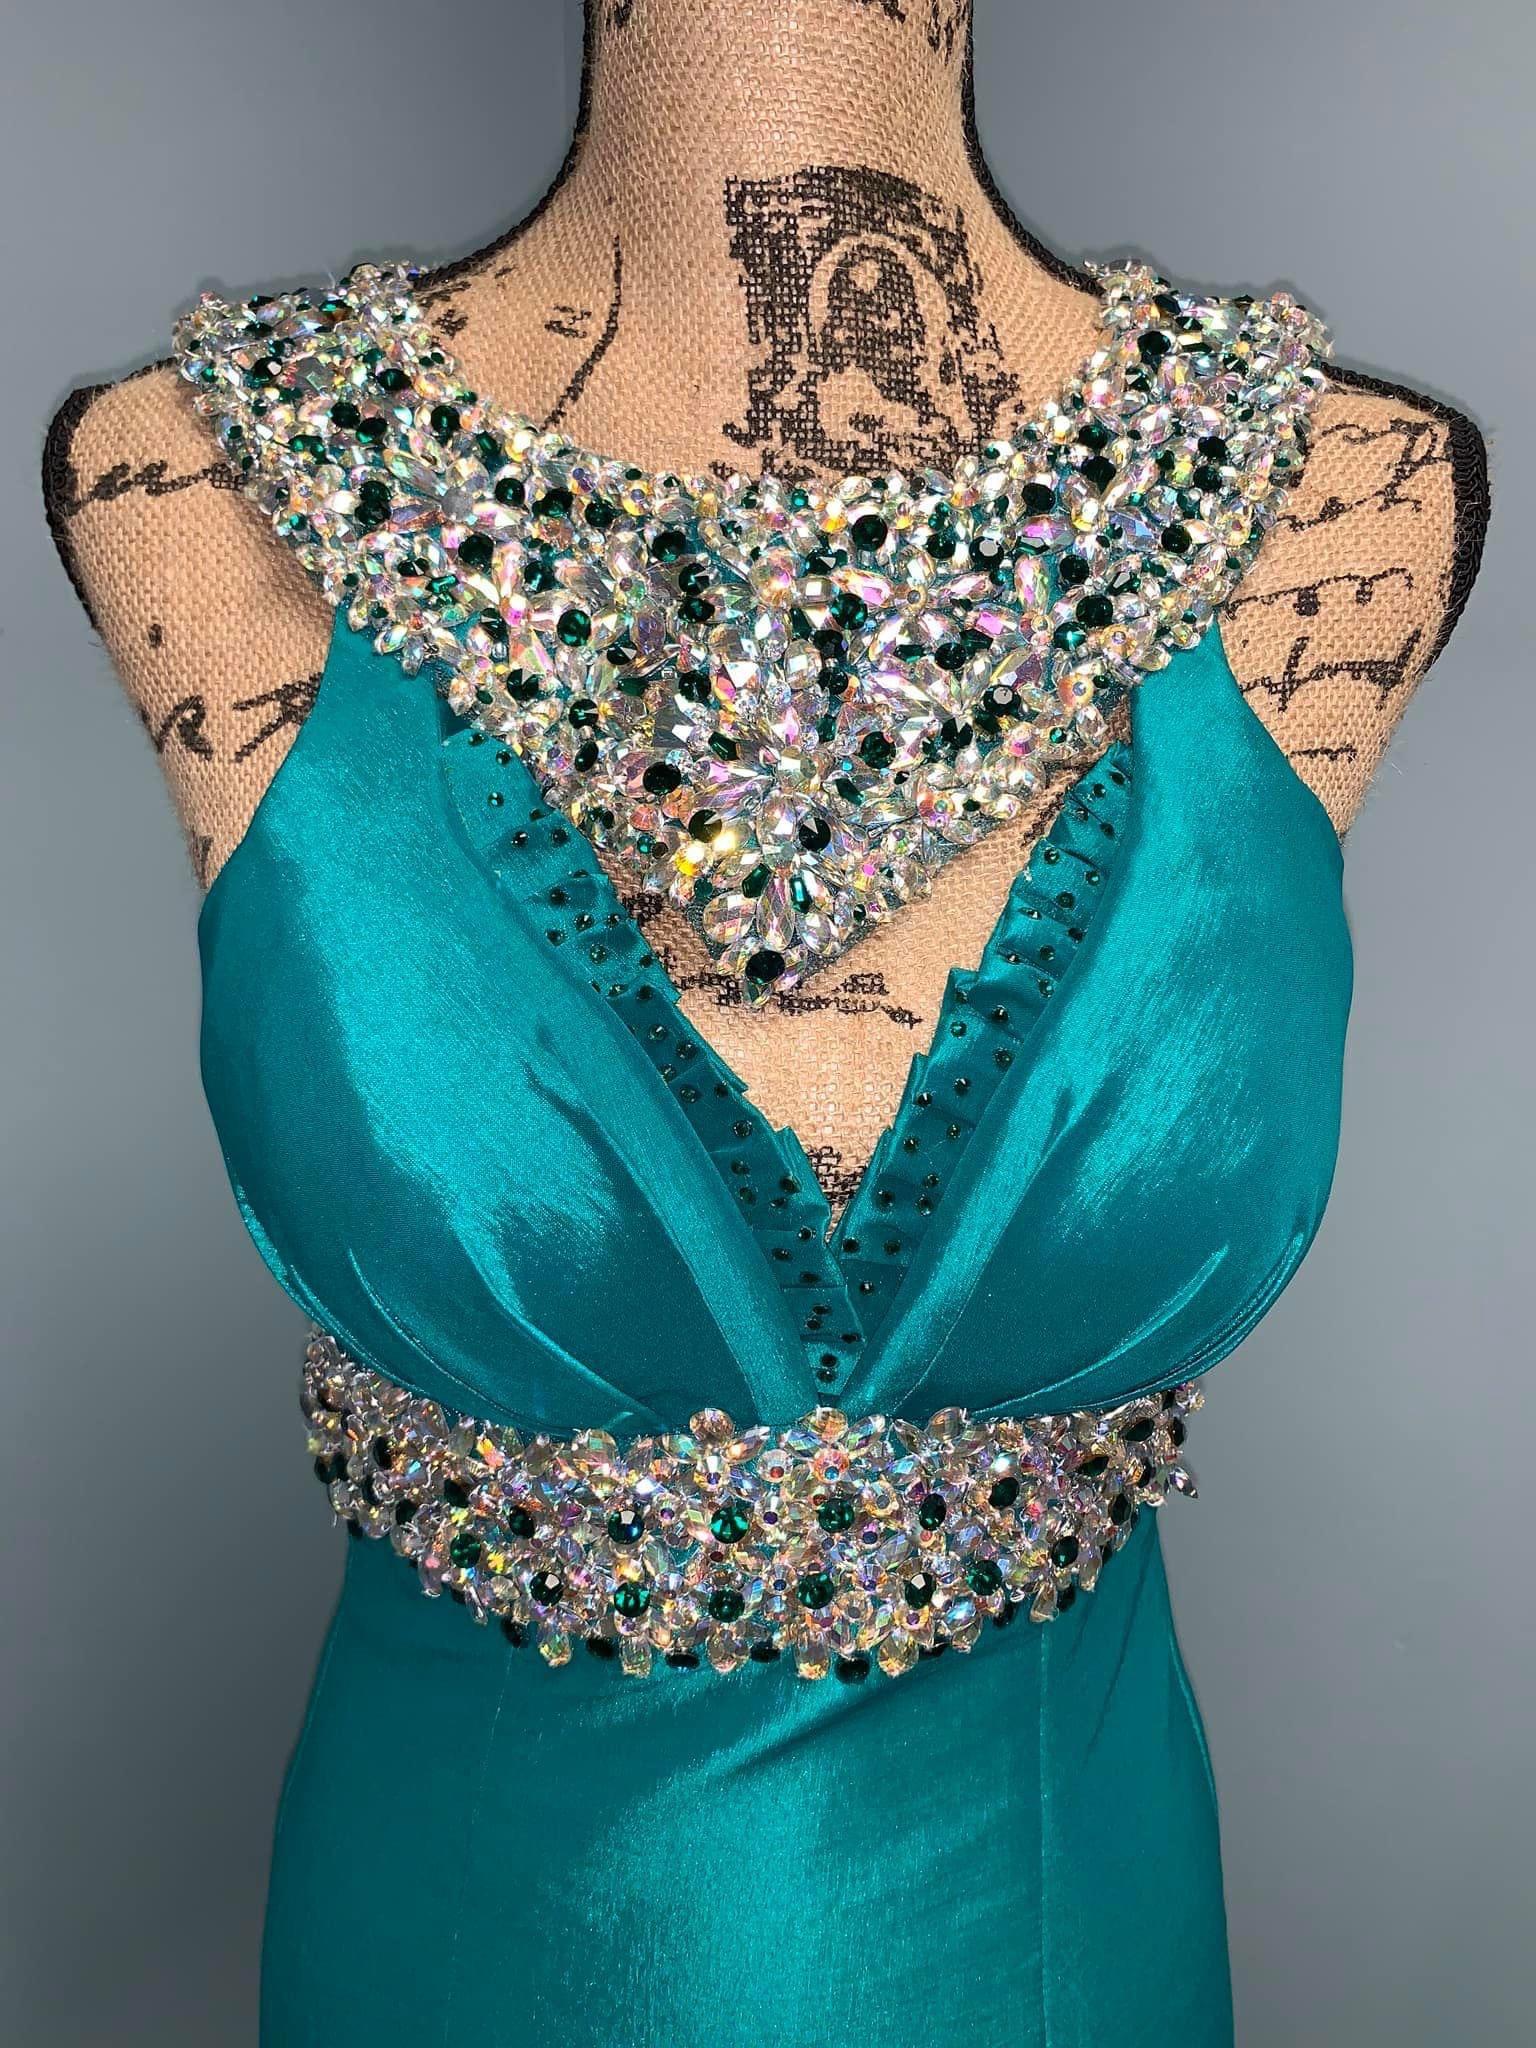 Ritzee Green Size 0 Backless Custom Mermaid Dress on Queenly